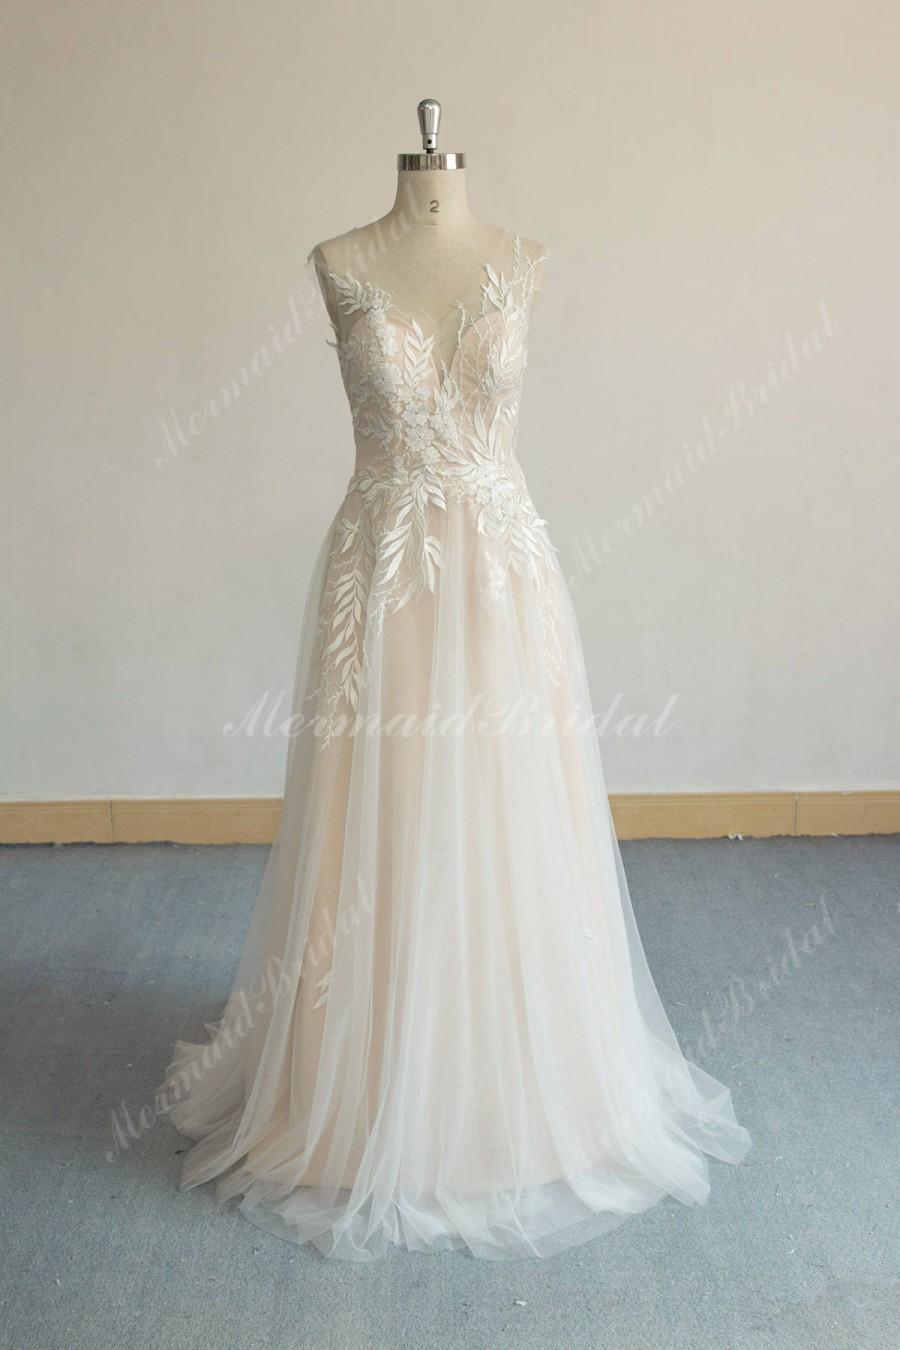 Hochzeit - Unique Aline Tulle Lace Wedding Dress, Elegant Vintage Boho Wedding Dress with Sweethear Neckline and Blush Lining